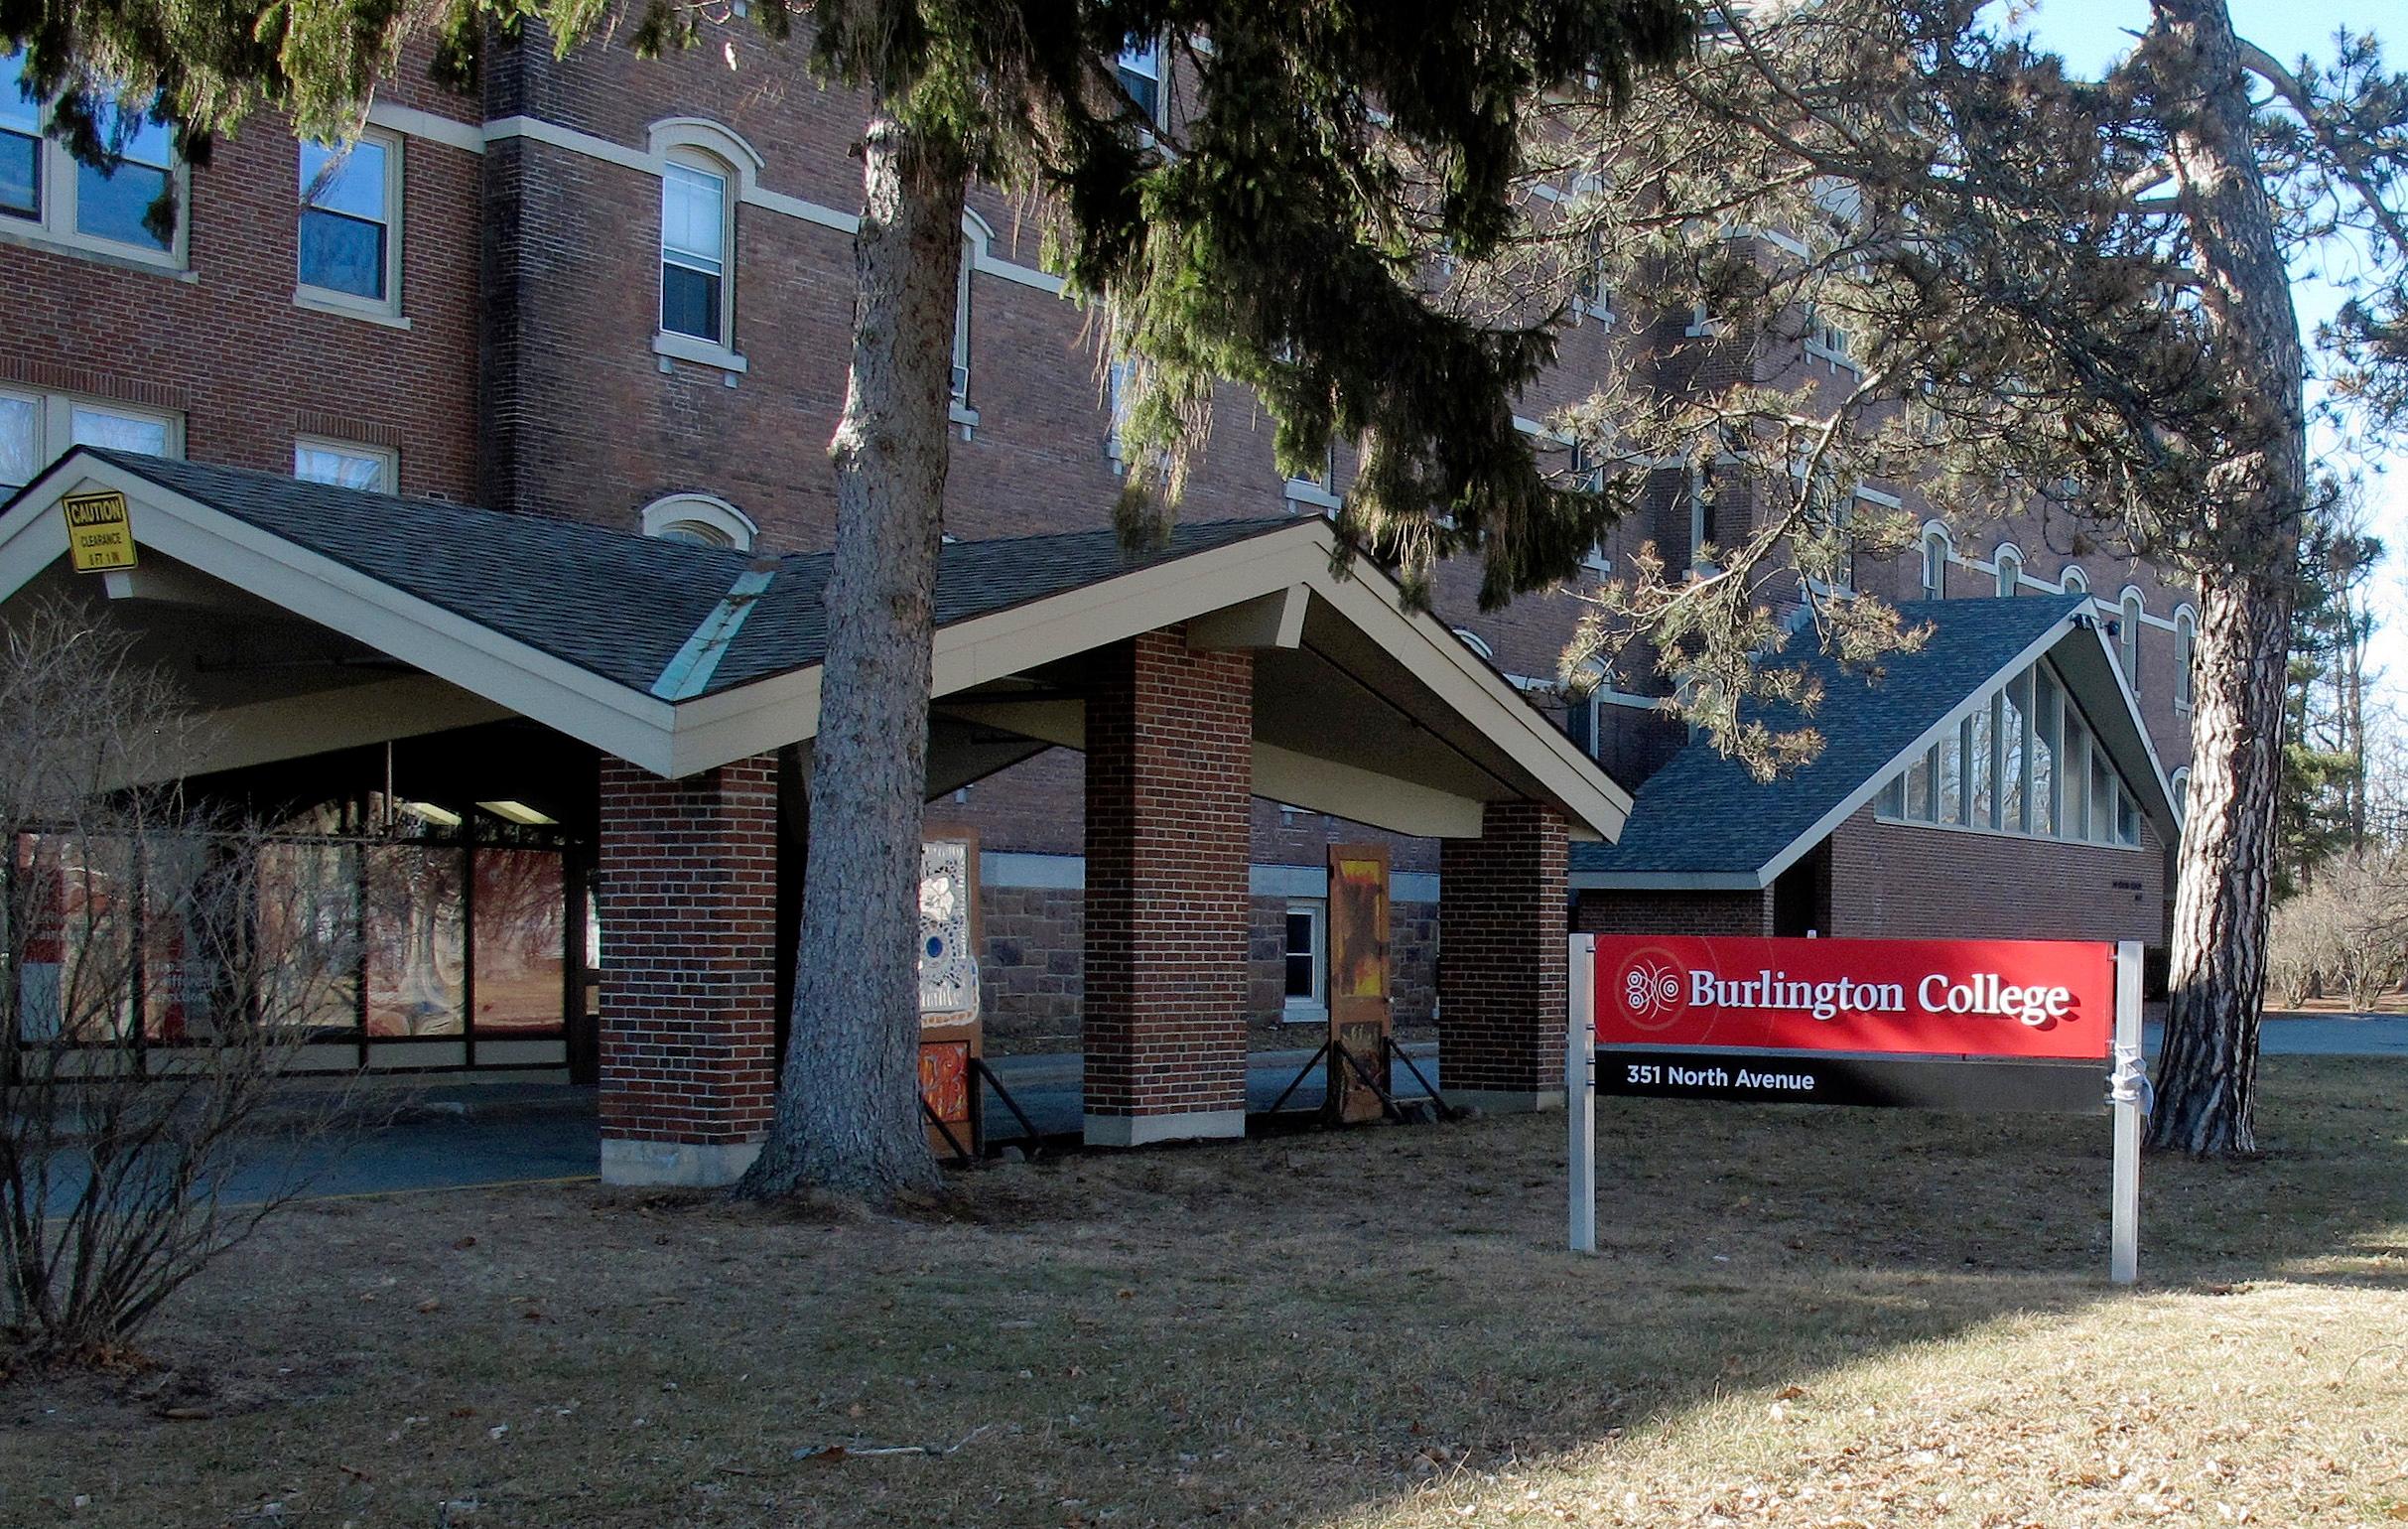 A building on the campus of Burlington College in Burlington, Vt., on Feb. 22, 2015.